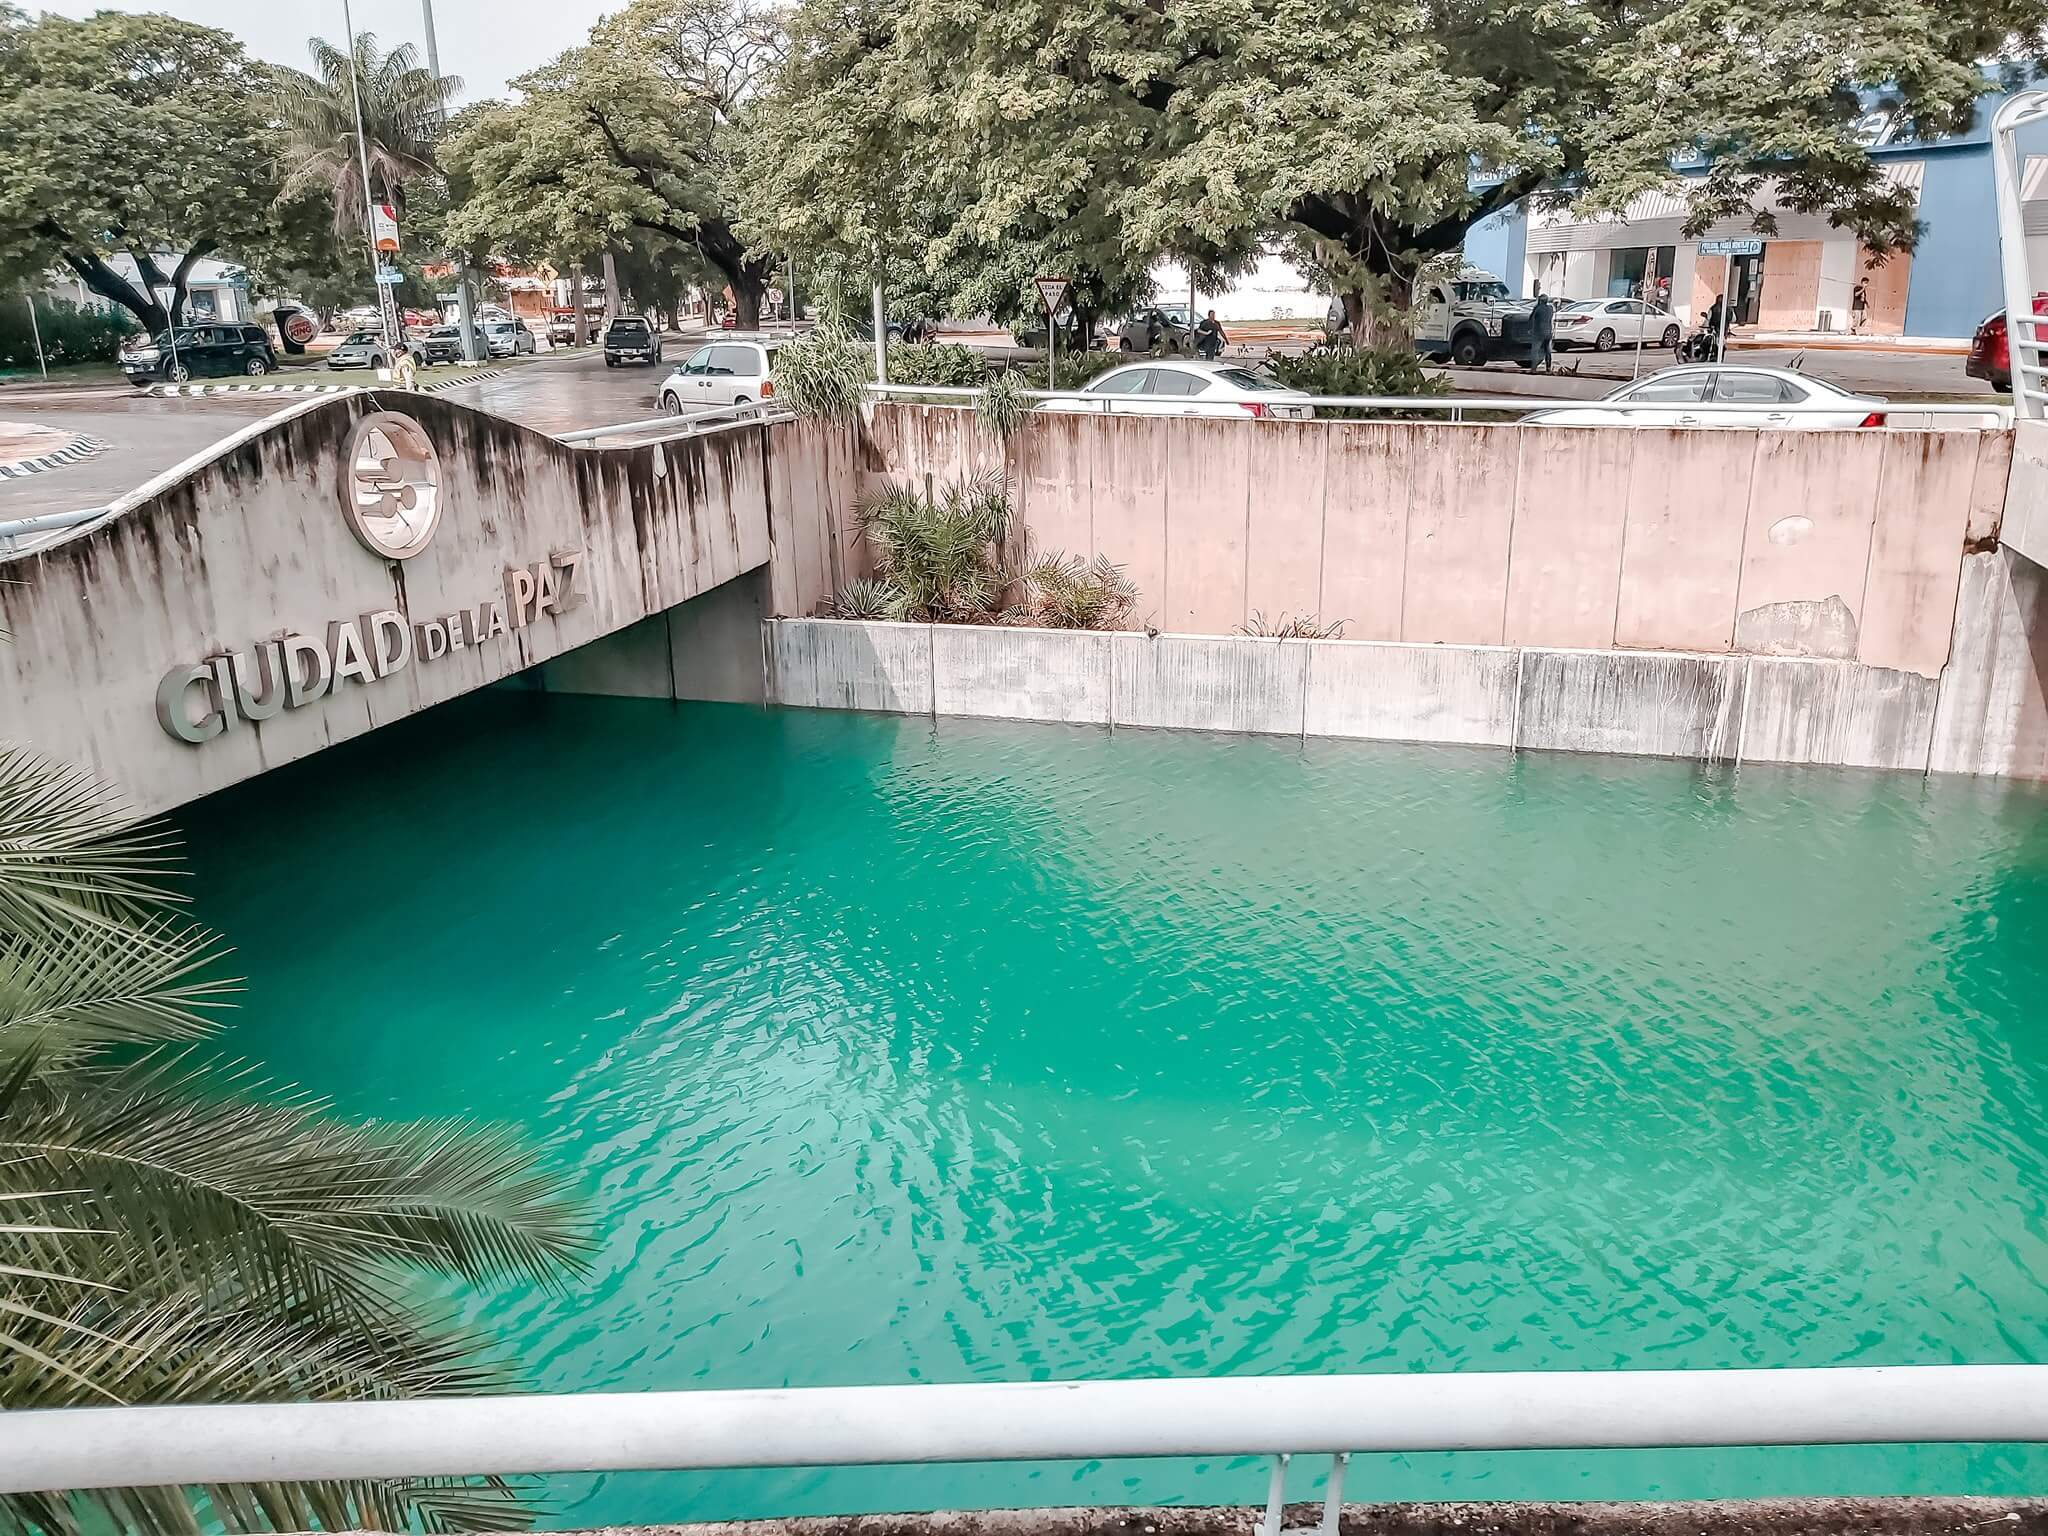 paso desnivel merida paso deprimido inundado agua azul cenote turquesa